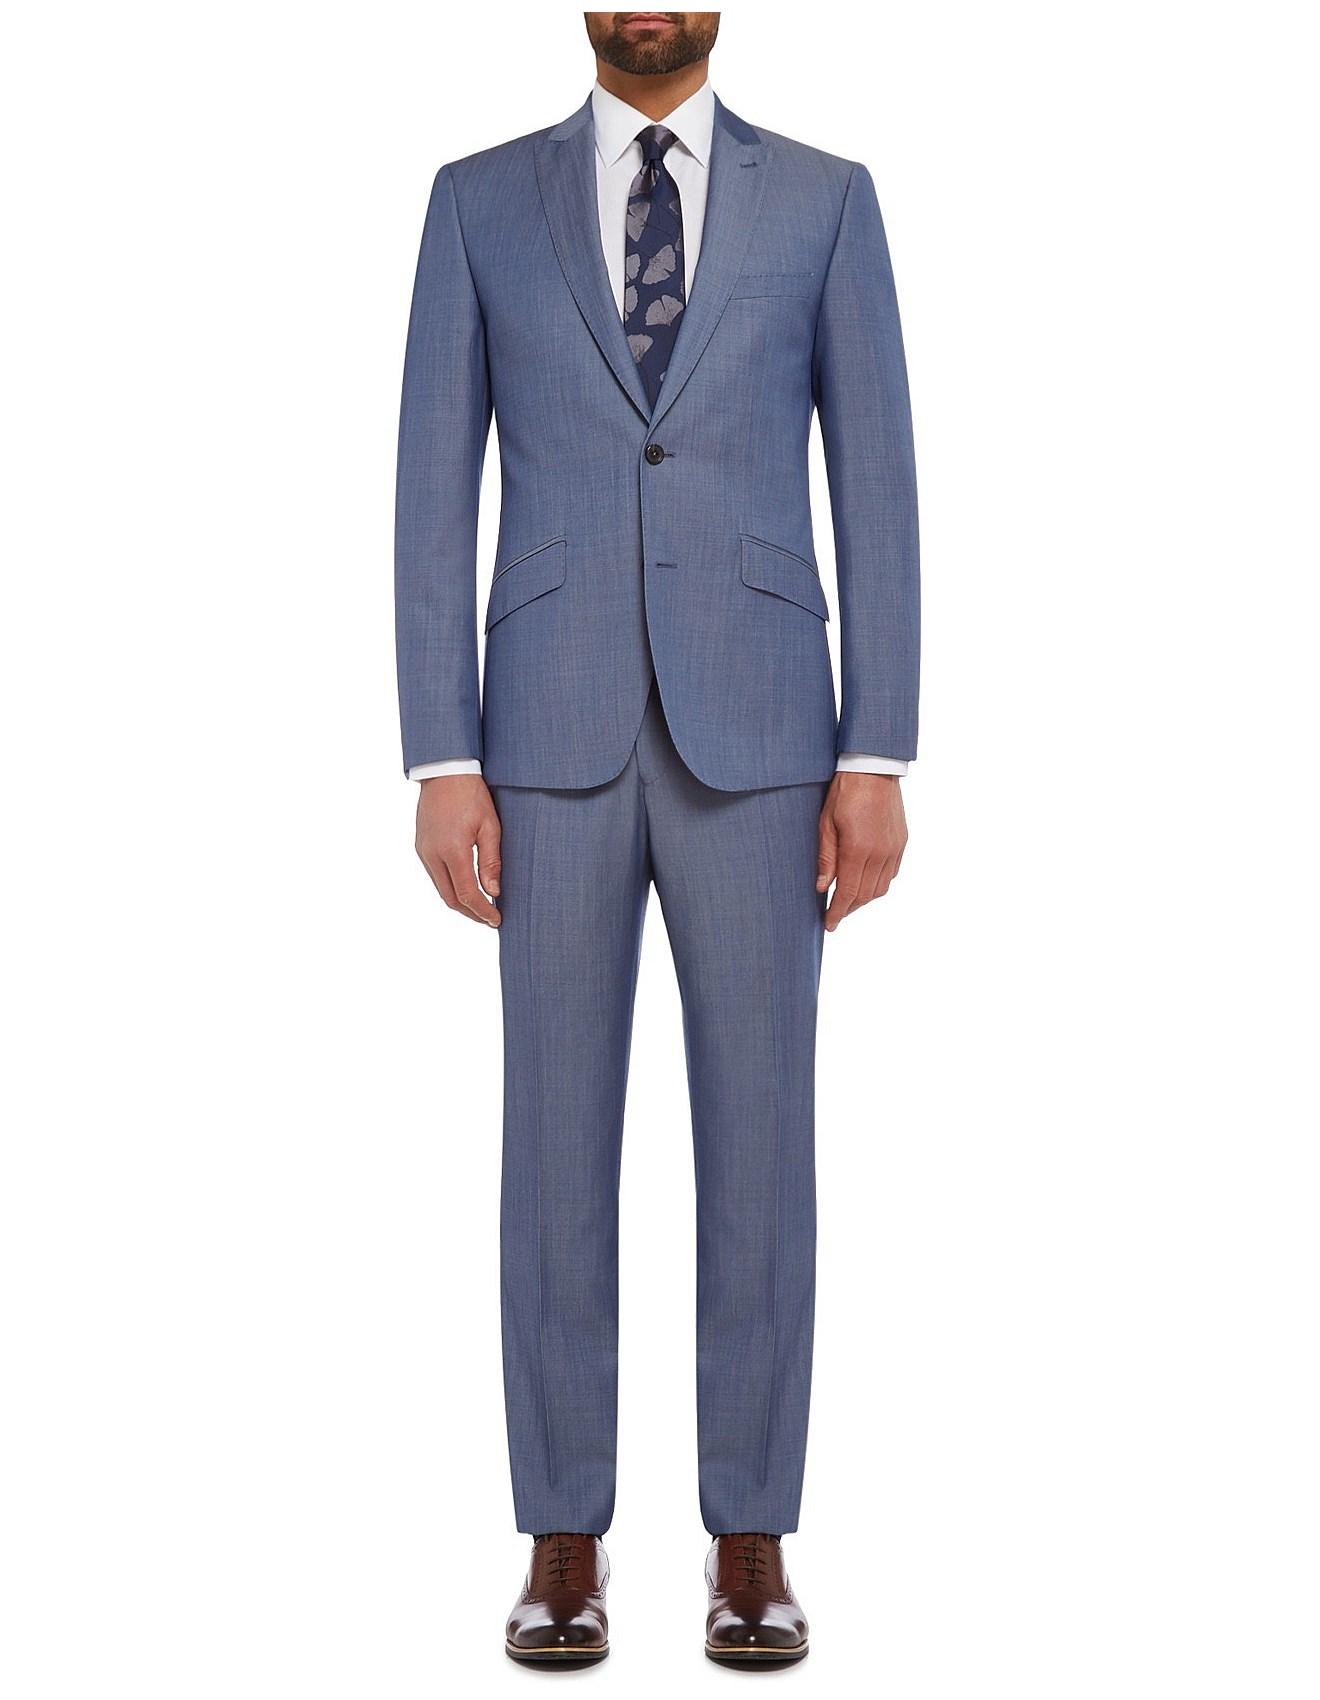 afbb241f Men's Suiting & Formal Wear Sale | Suits For Men | David Jones - WOOL BI  TWILL PLAIN PEAK SUIT